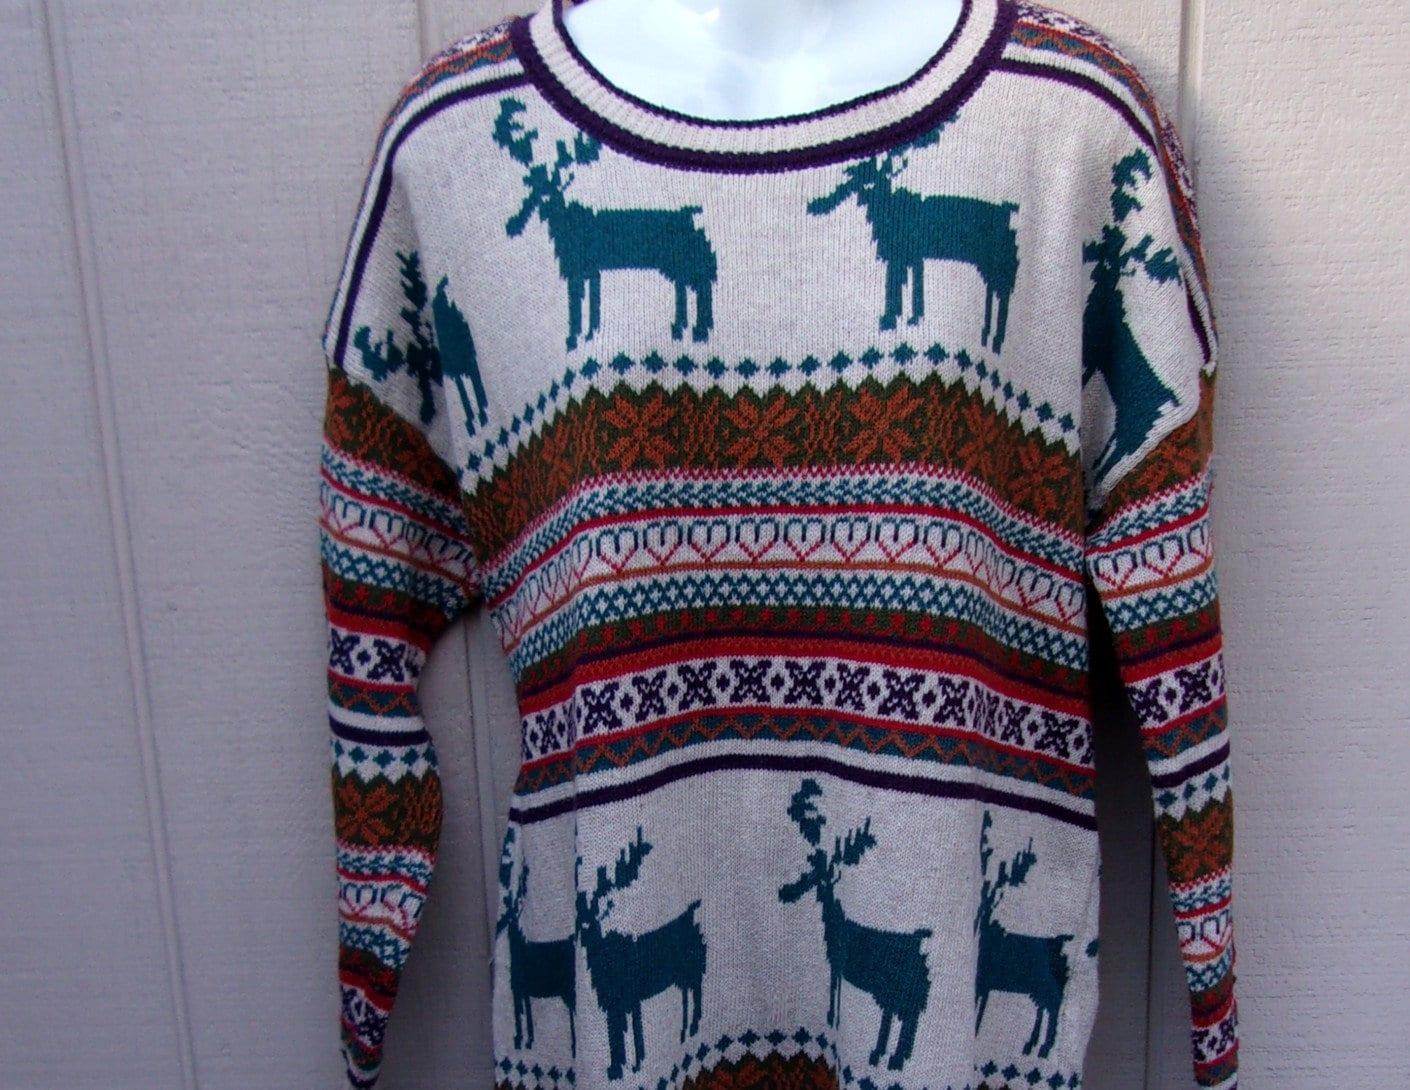 80s Sweatshirts, Sweaters, Vests | Women Vntge Xl Reindeer Ski Sweater  Fair Isle Knit  Size - Xxl $23.00 AT vintagedancer.com